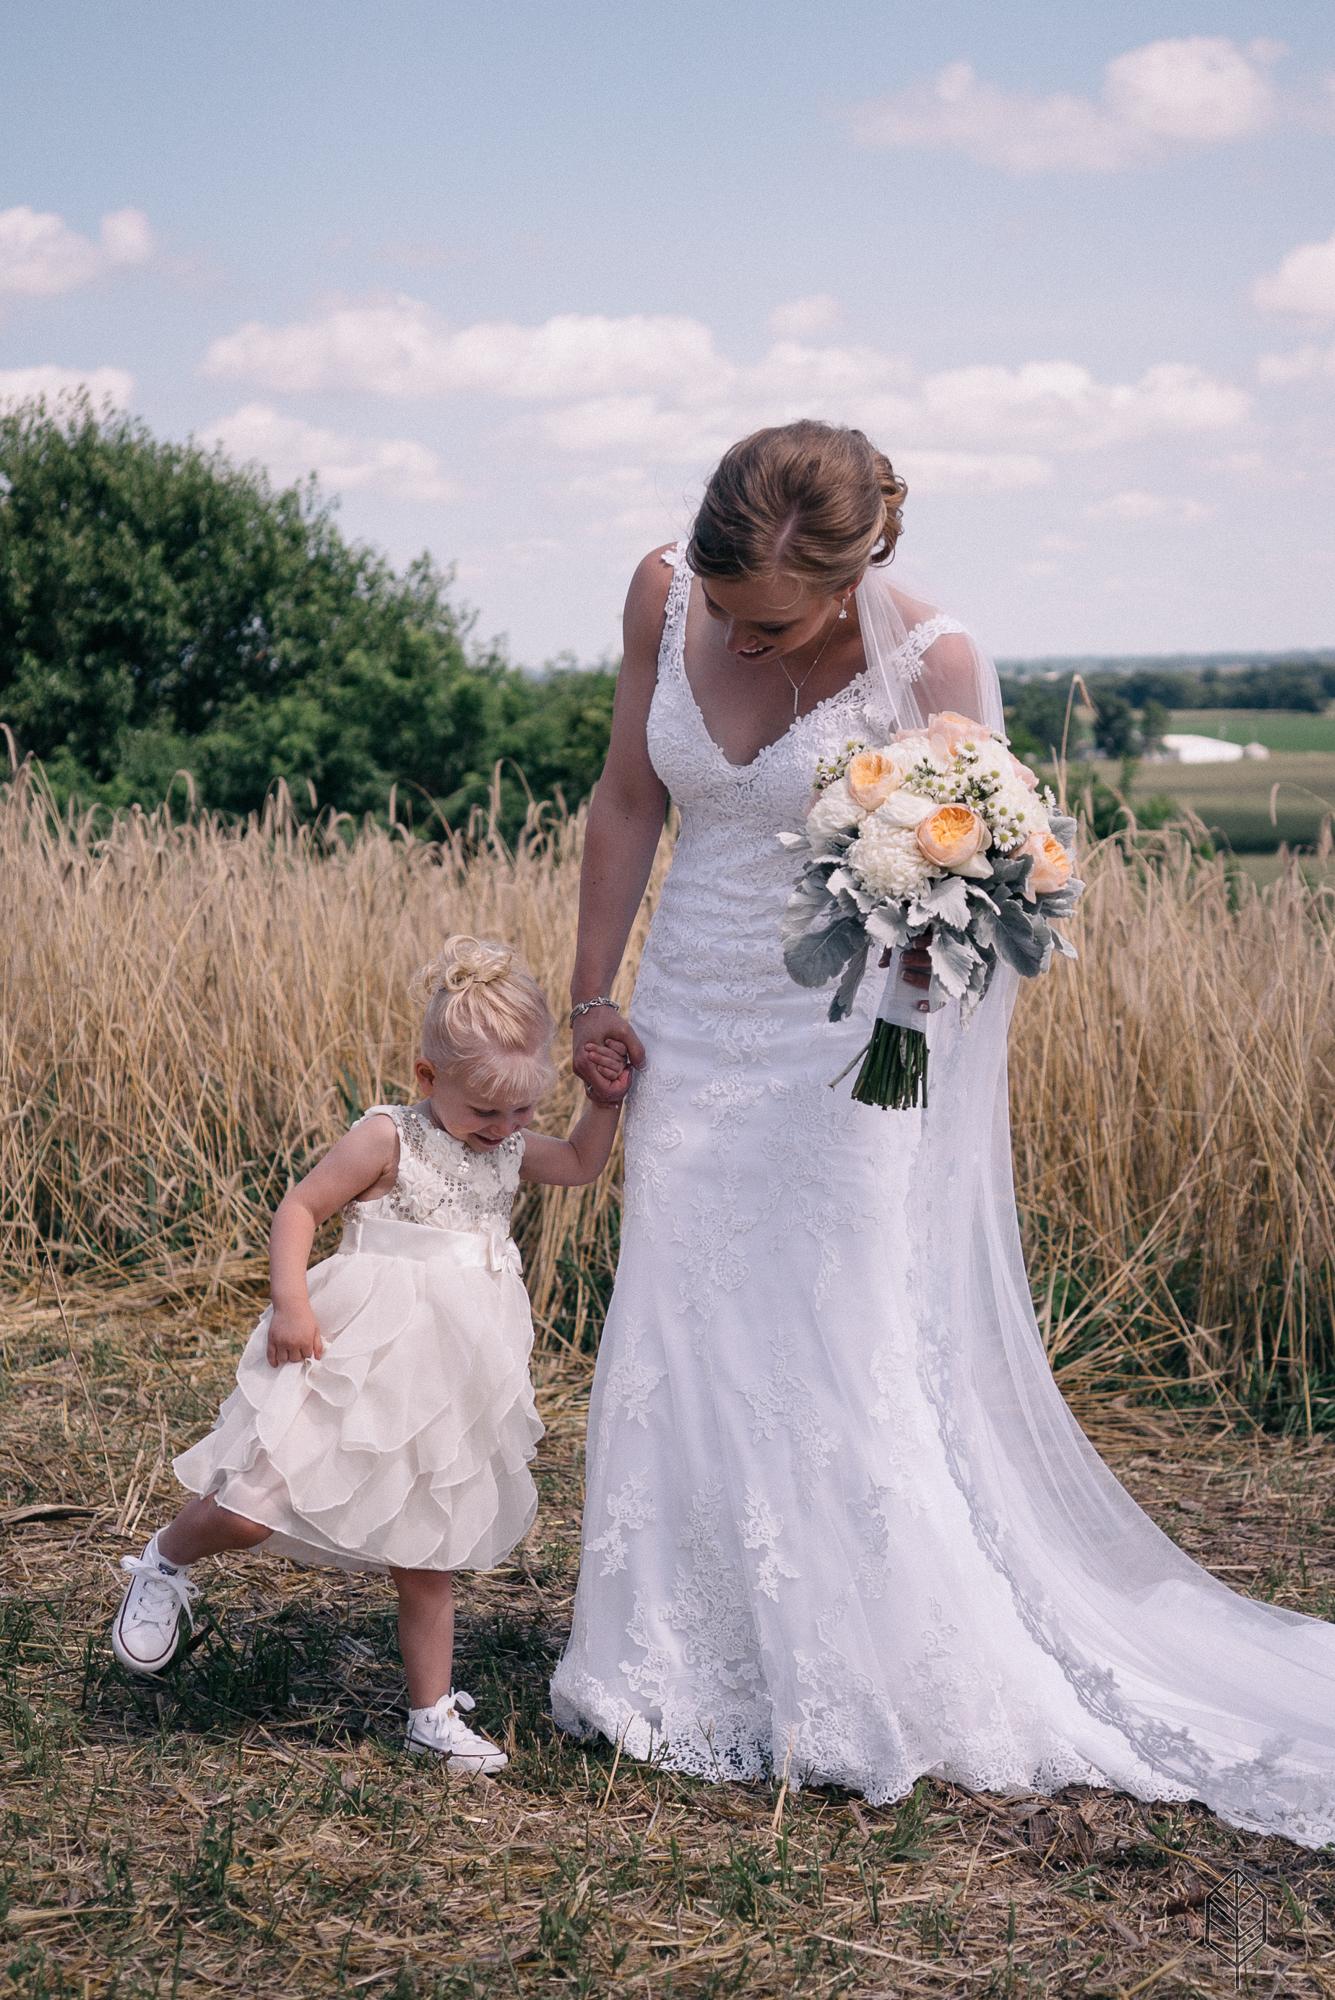 johnsonscreative_Ambrosia_wedding-31.jpg